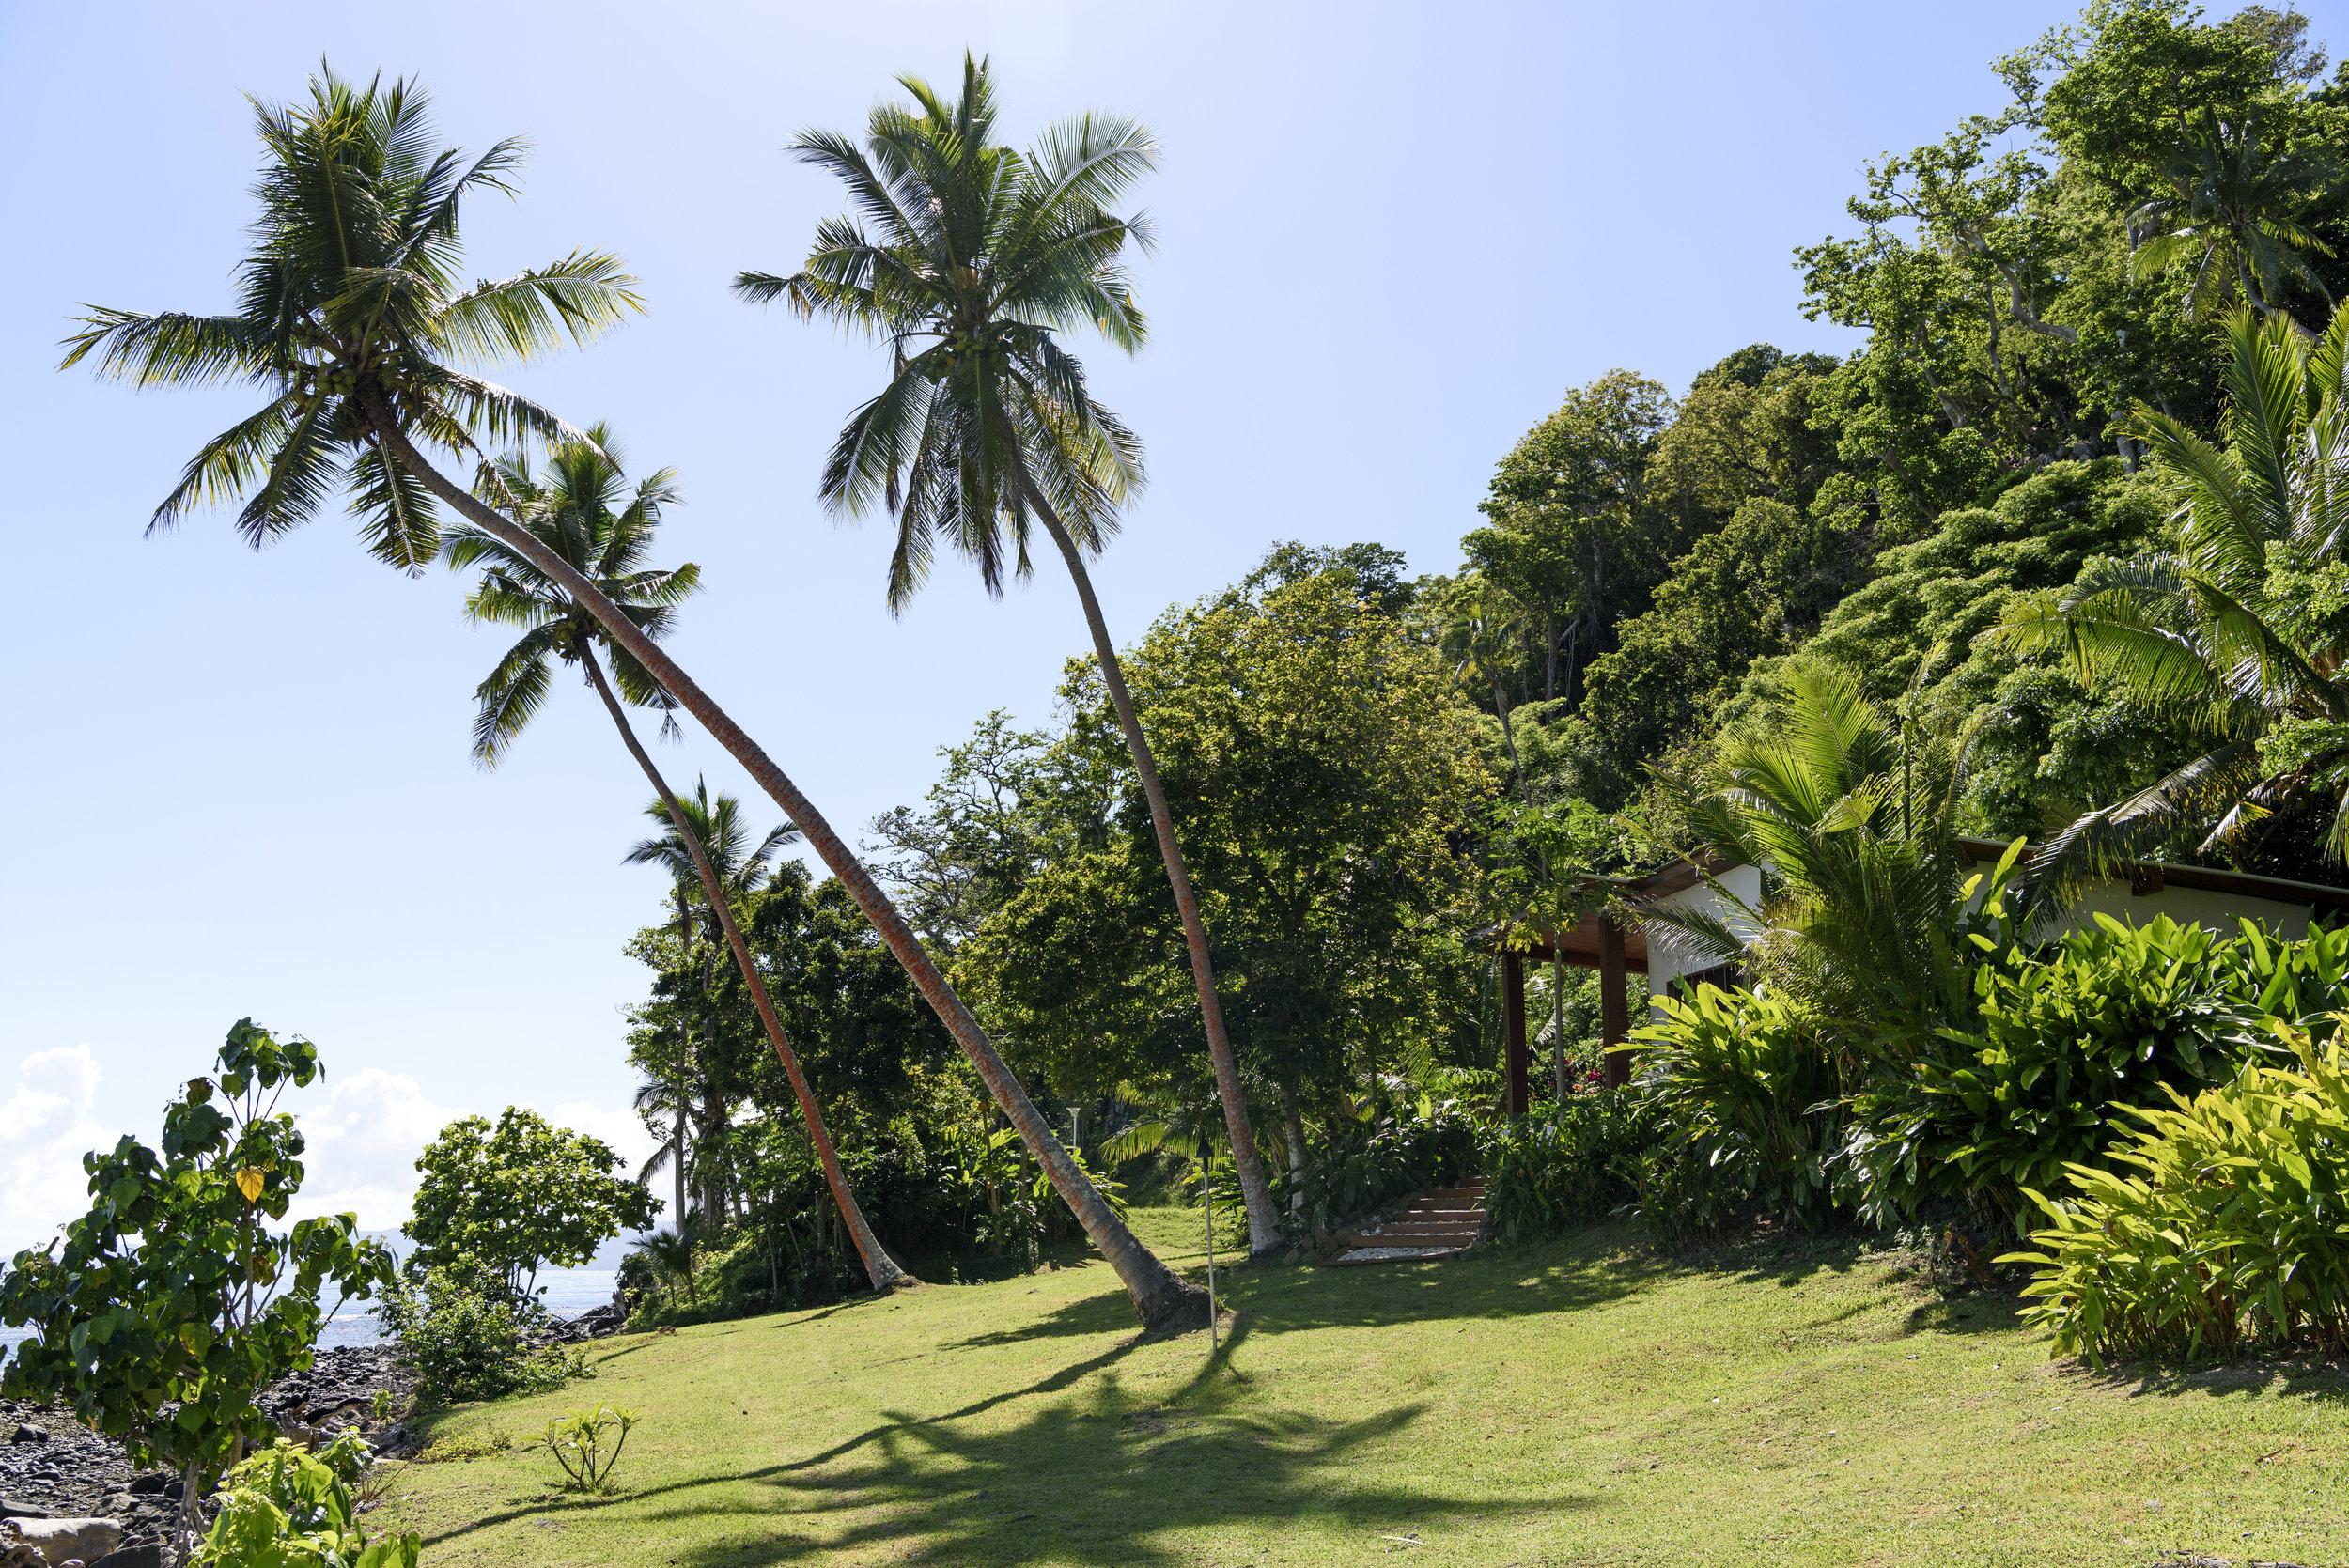 Fiji Resort - Couples Accommodation - Royal Retreat - Honeymoon - The Remote Resort.jpg